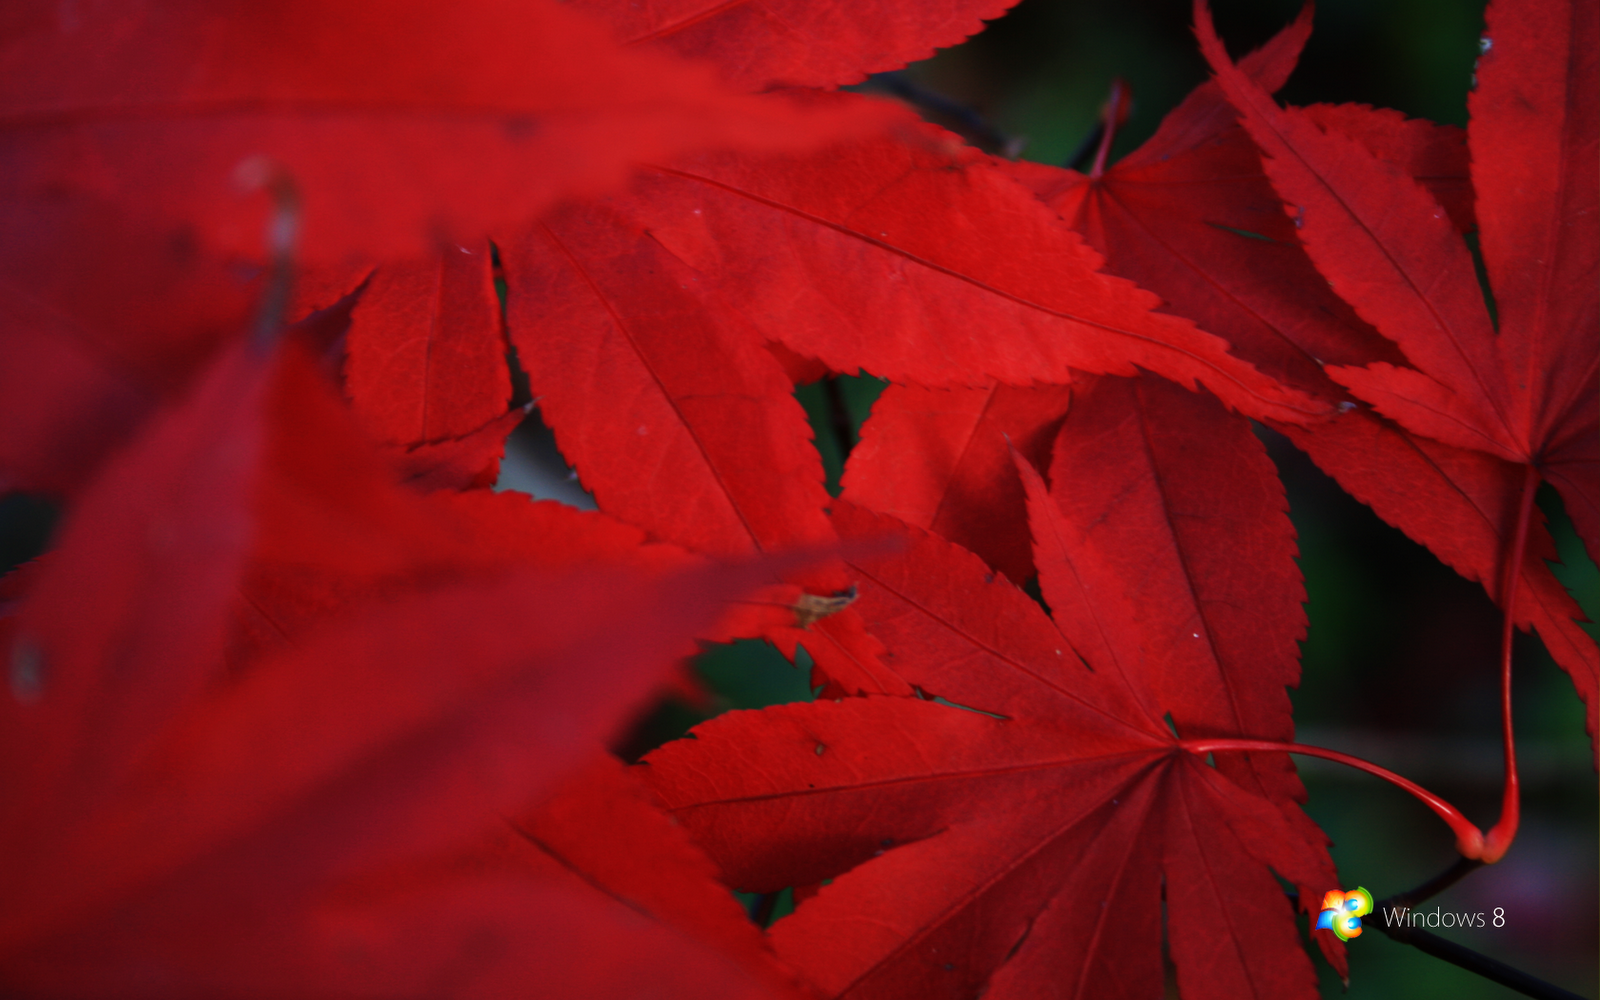 Red Windows 10 Wallpaper HD